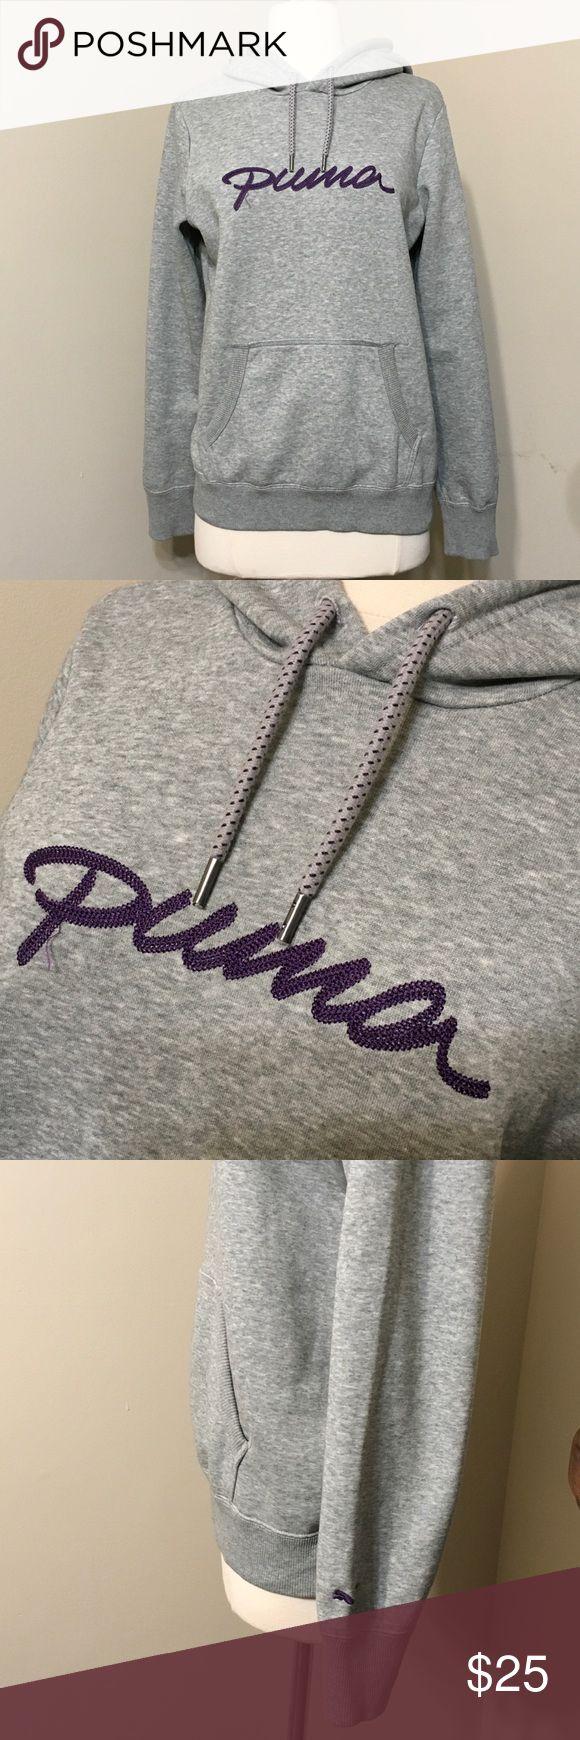 PUMA Sport lifestyle Size M New,no tags Puma Tops